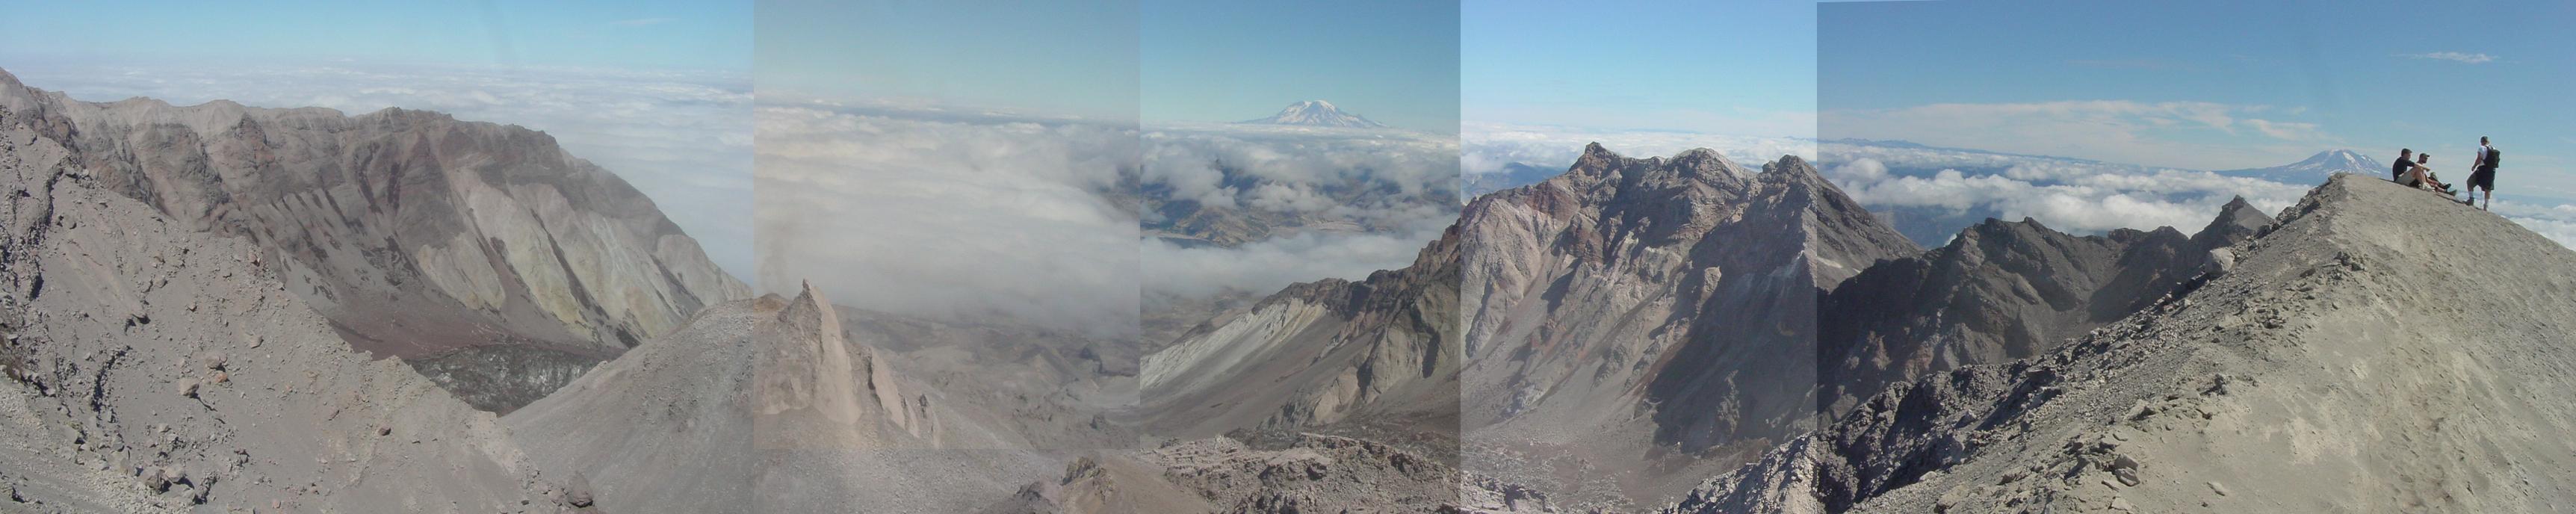 Mt St helens rim panorama